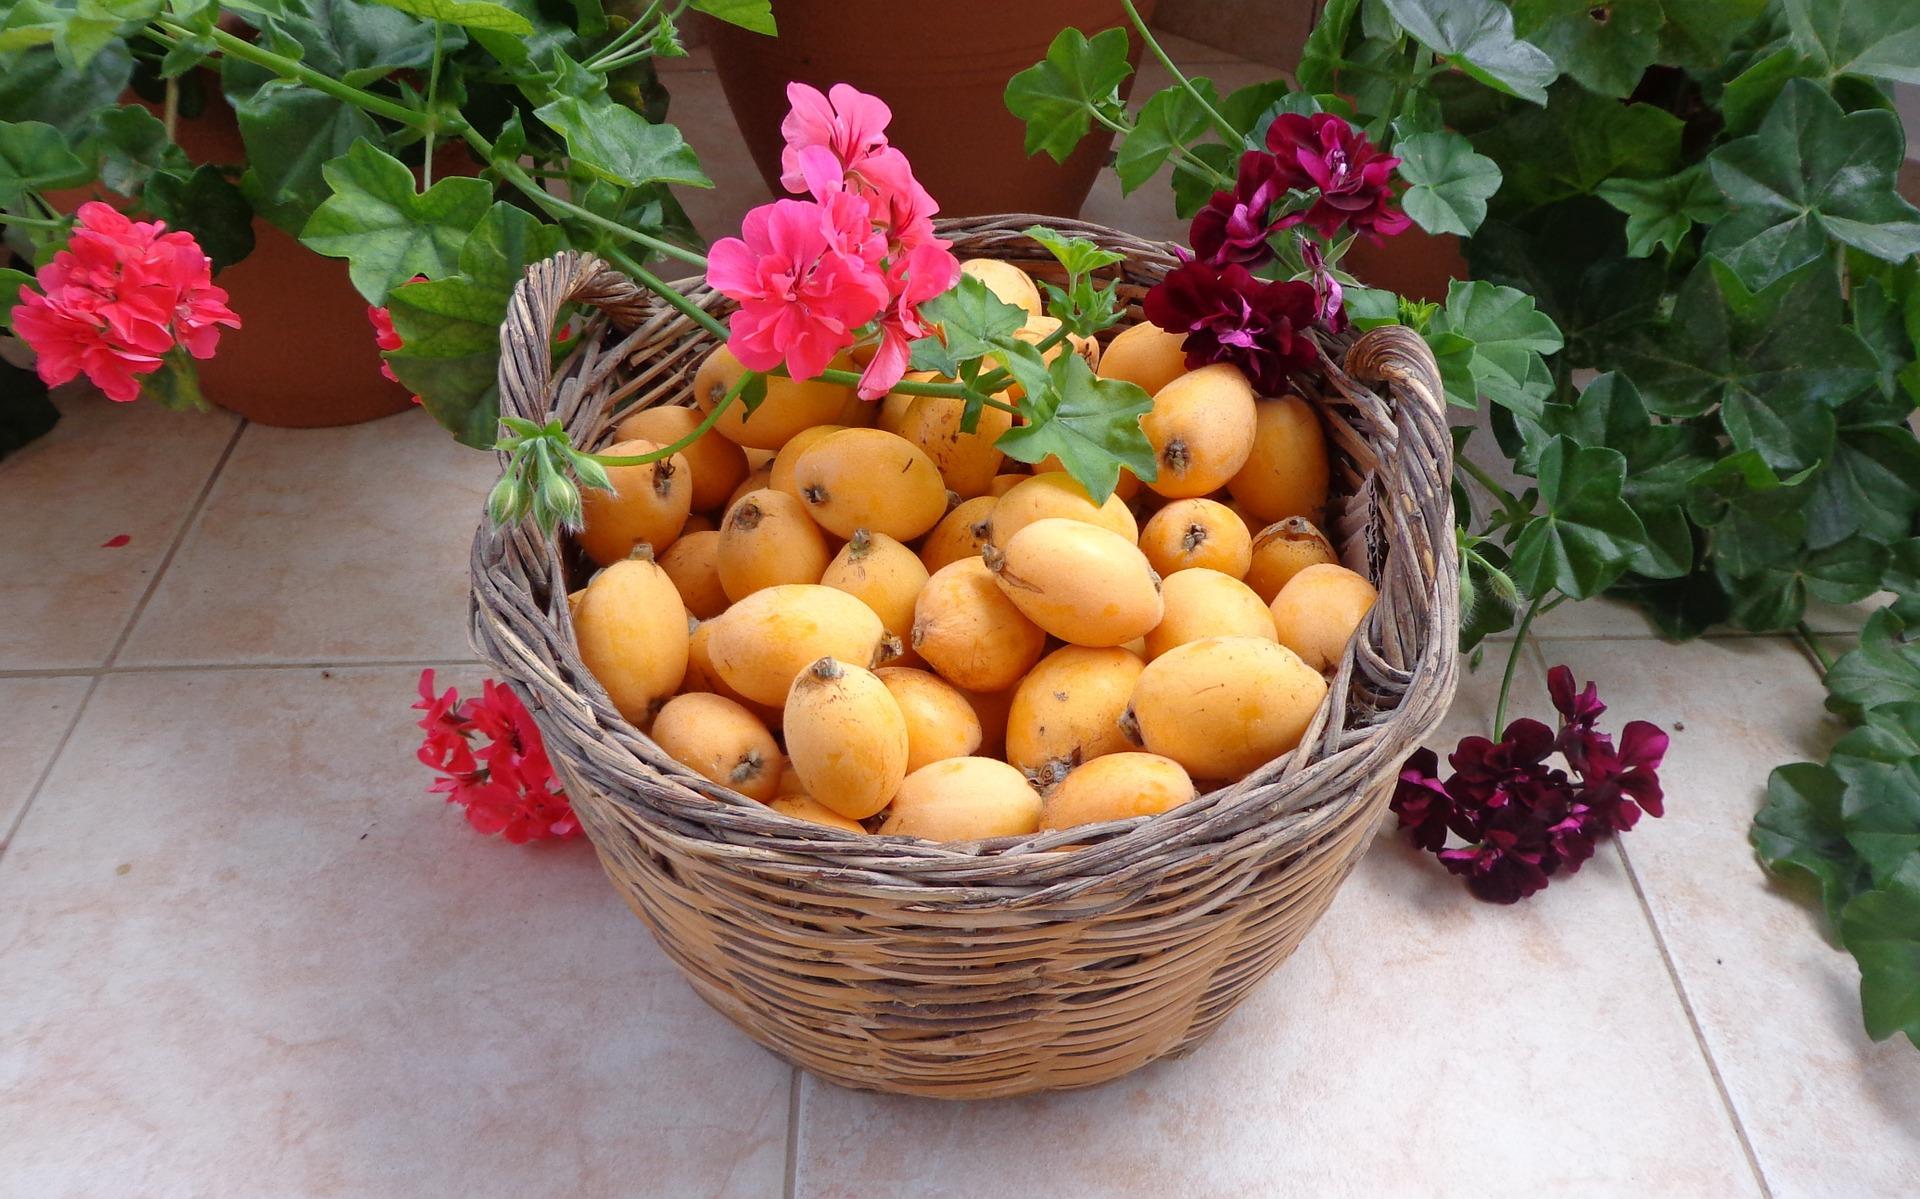 fruits-707149_1920 pixabay.jpg